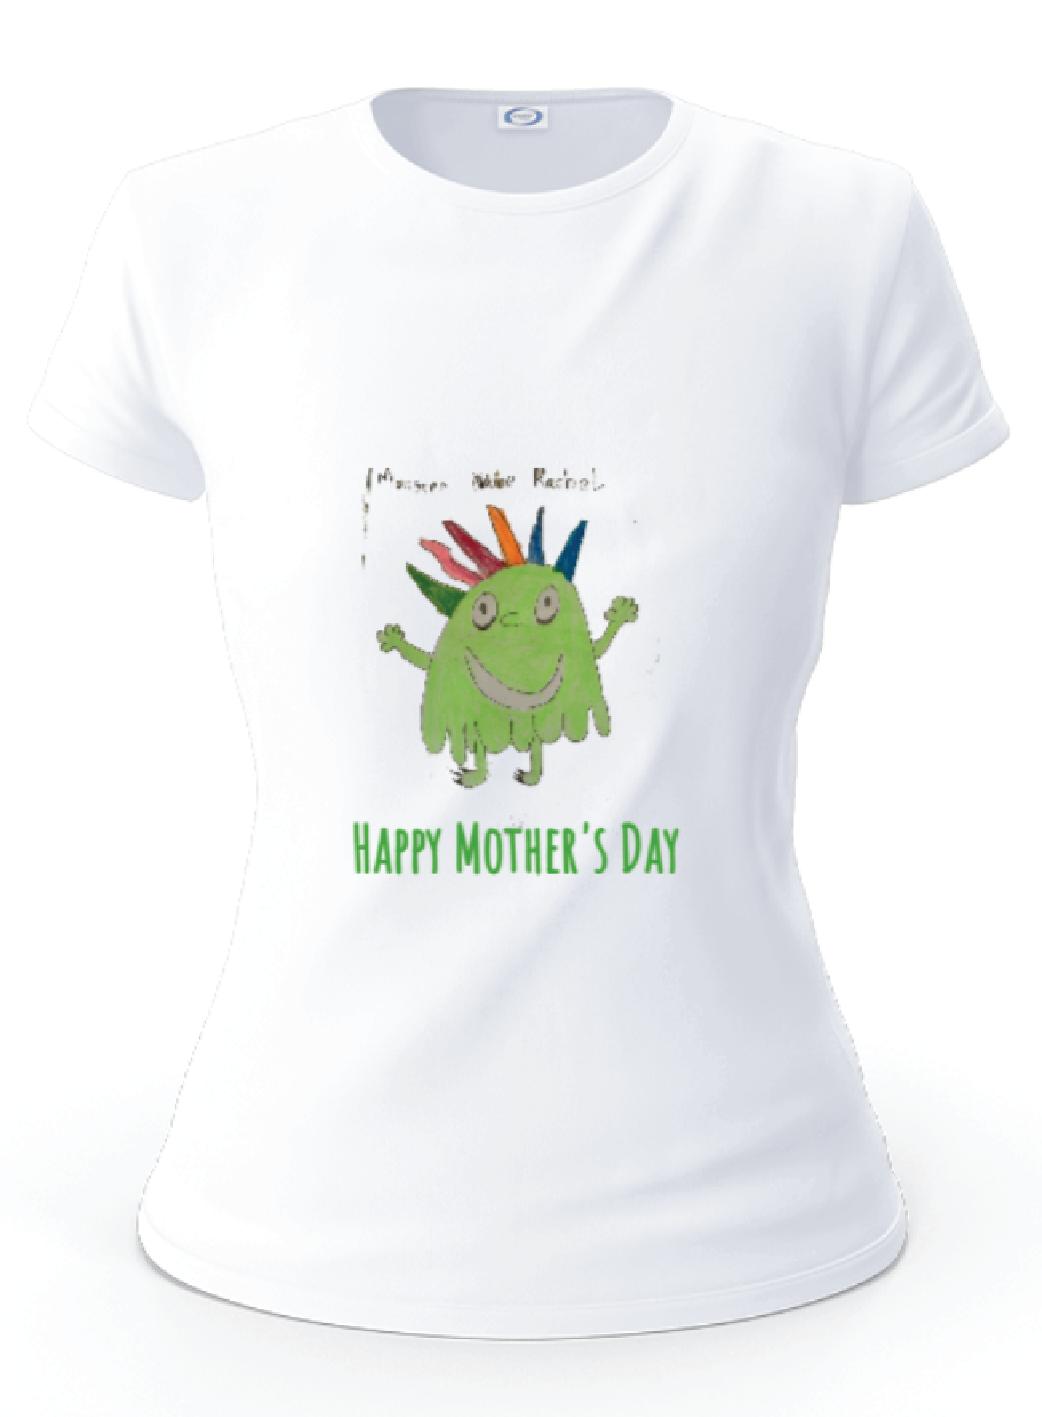 Children's Artwork Printed T-shirt  Image